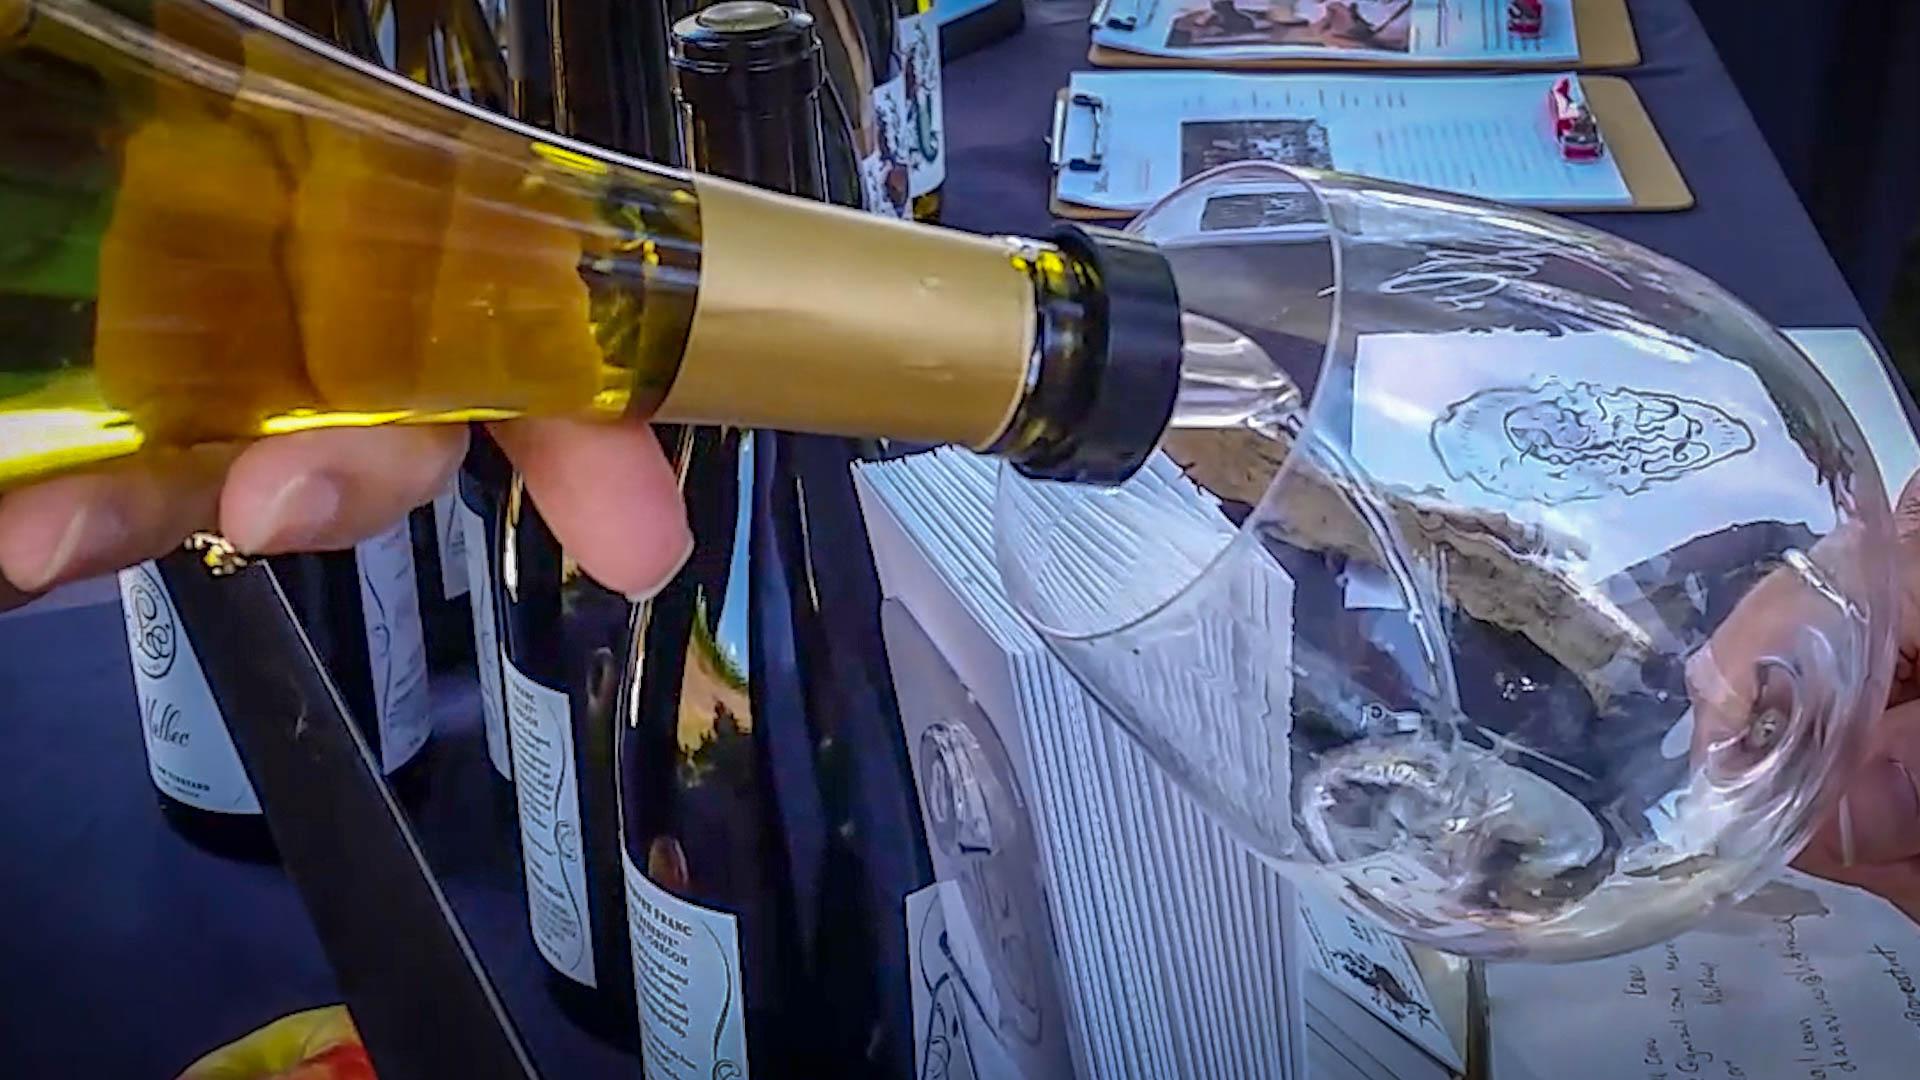 Leah Jørgensen Cellars 2017 Sauvignon Blanc